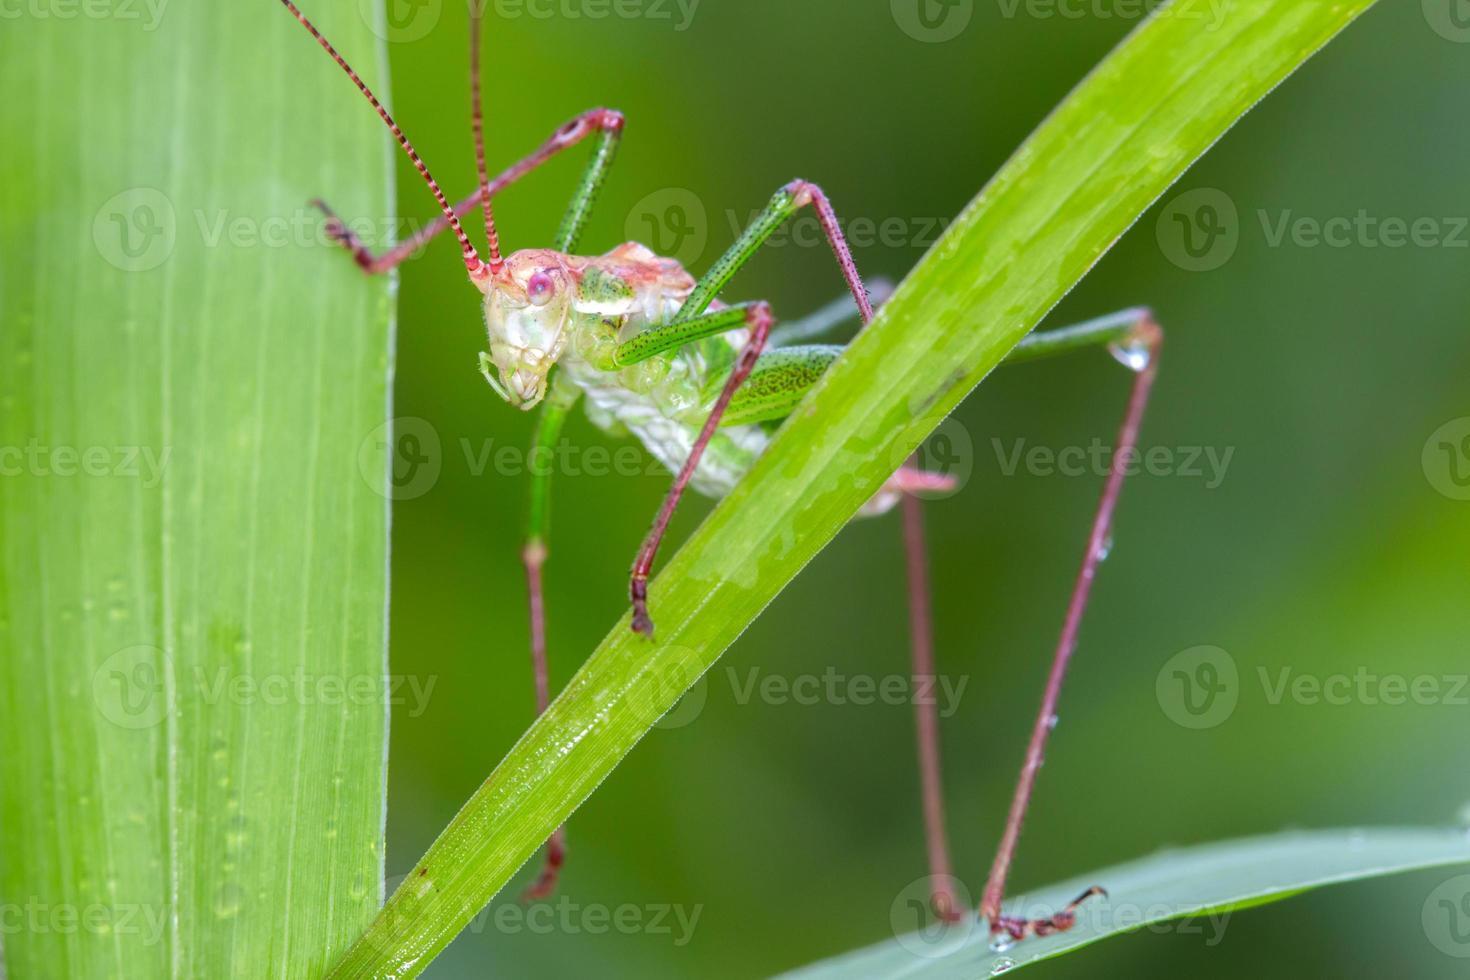 gräshoppa på gräs foto